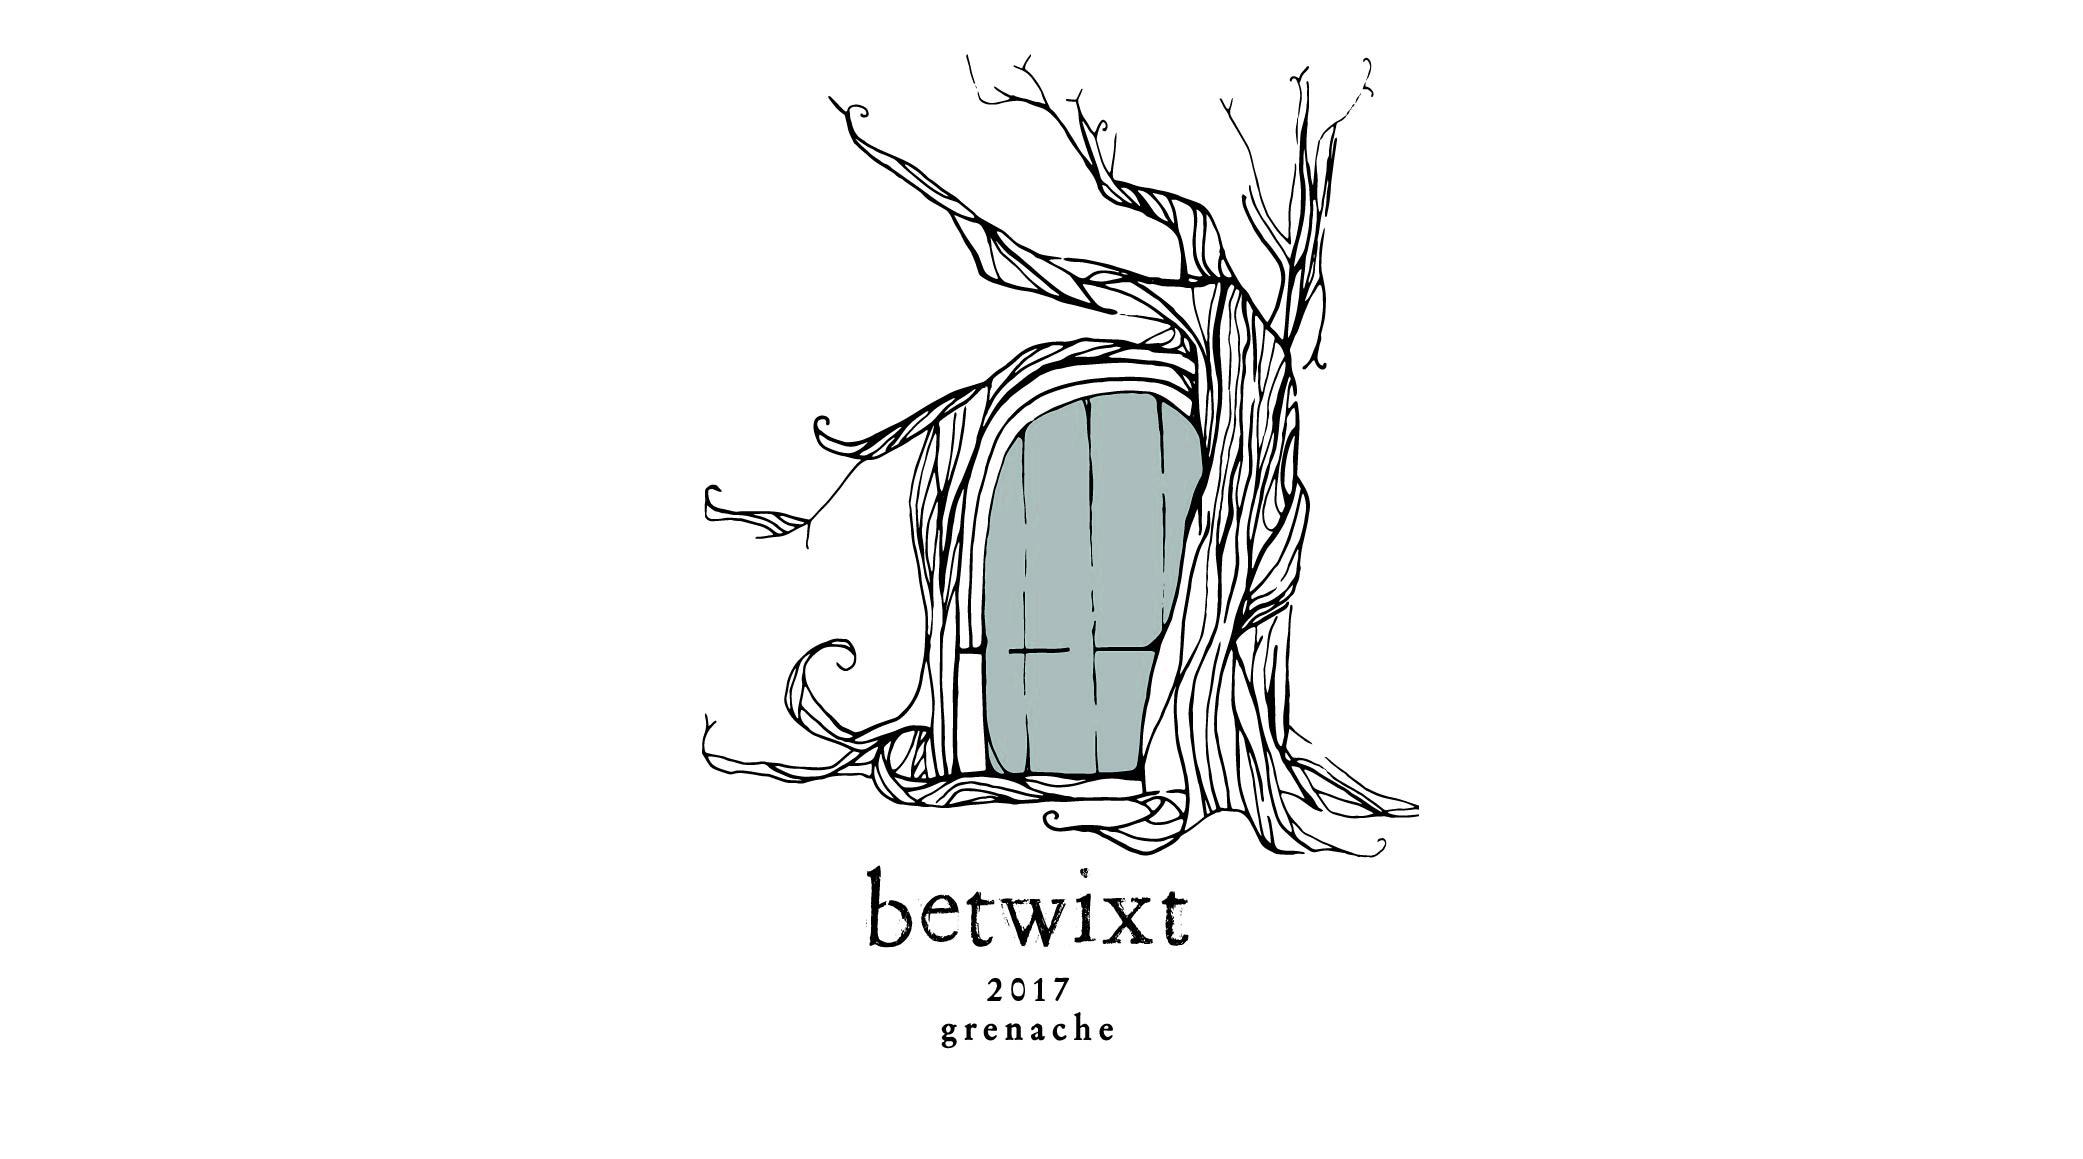 betwixt_boer_grenache_2017_whitebackground